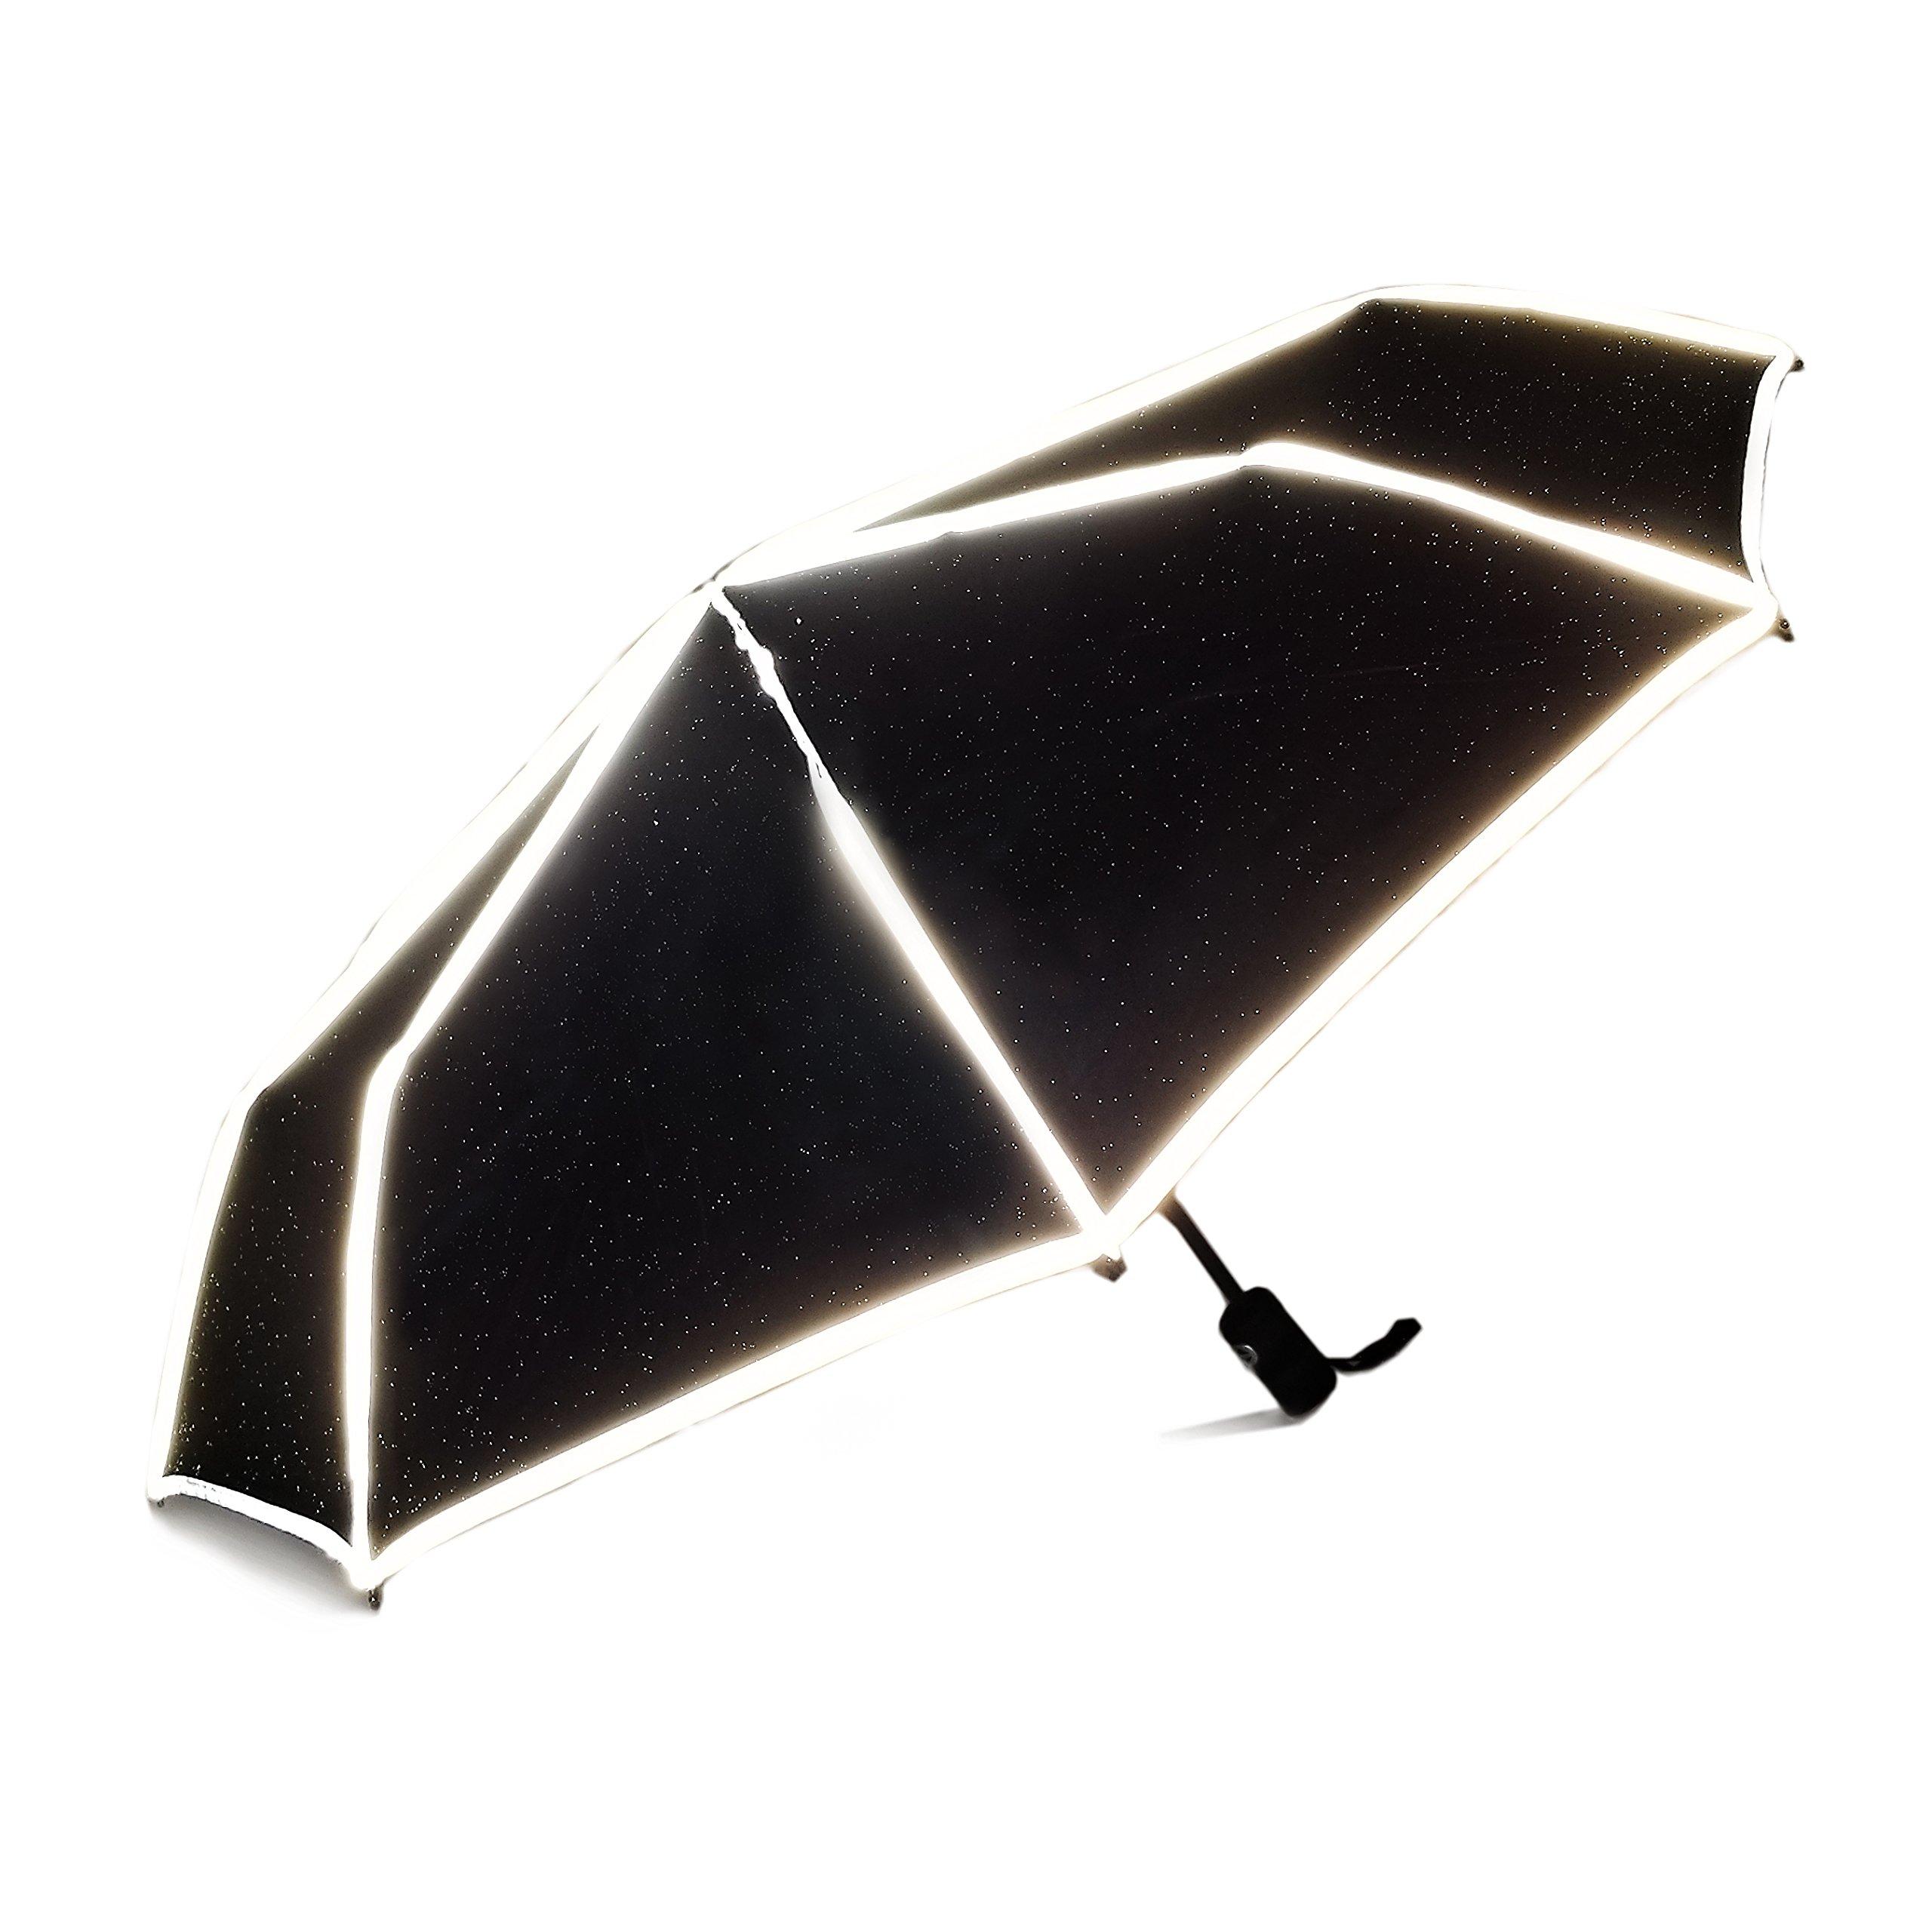 World's Smartest Reflective Compact Umbrella with patent-pending ReflectSafe design by ReflectSafe Umbrella